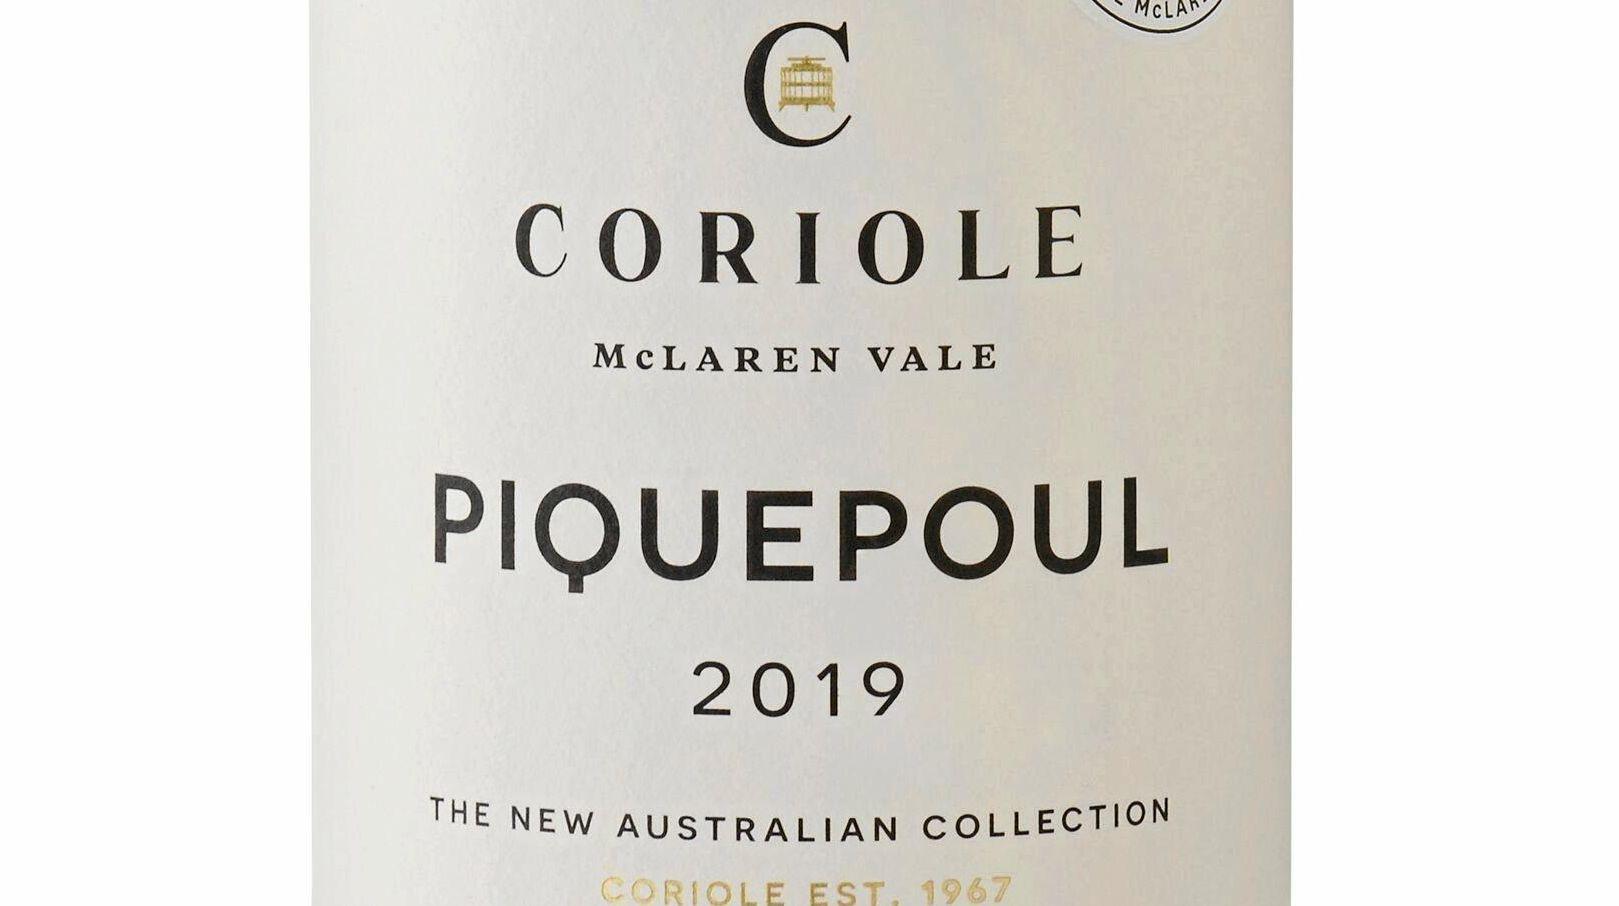 Piquepoul, 2019.